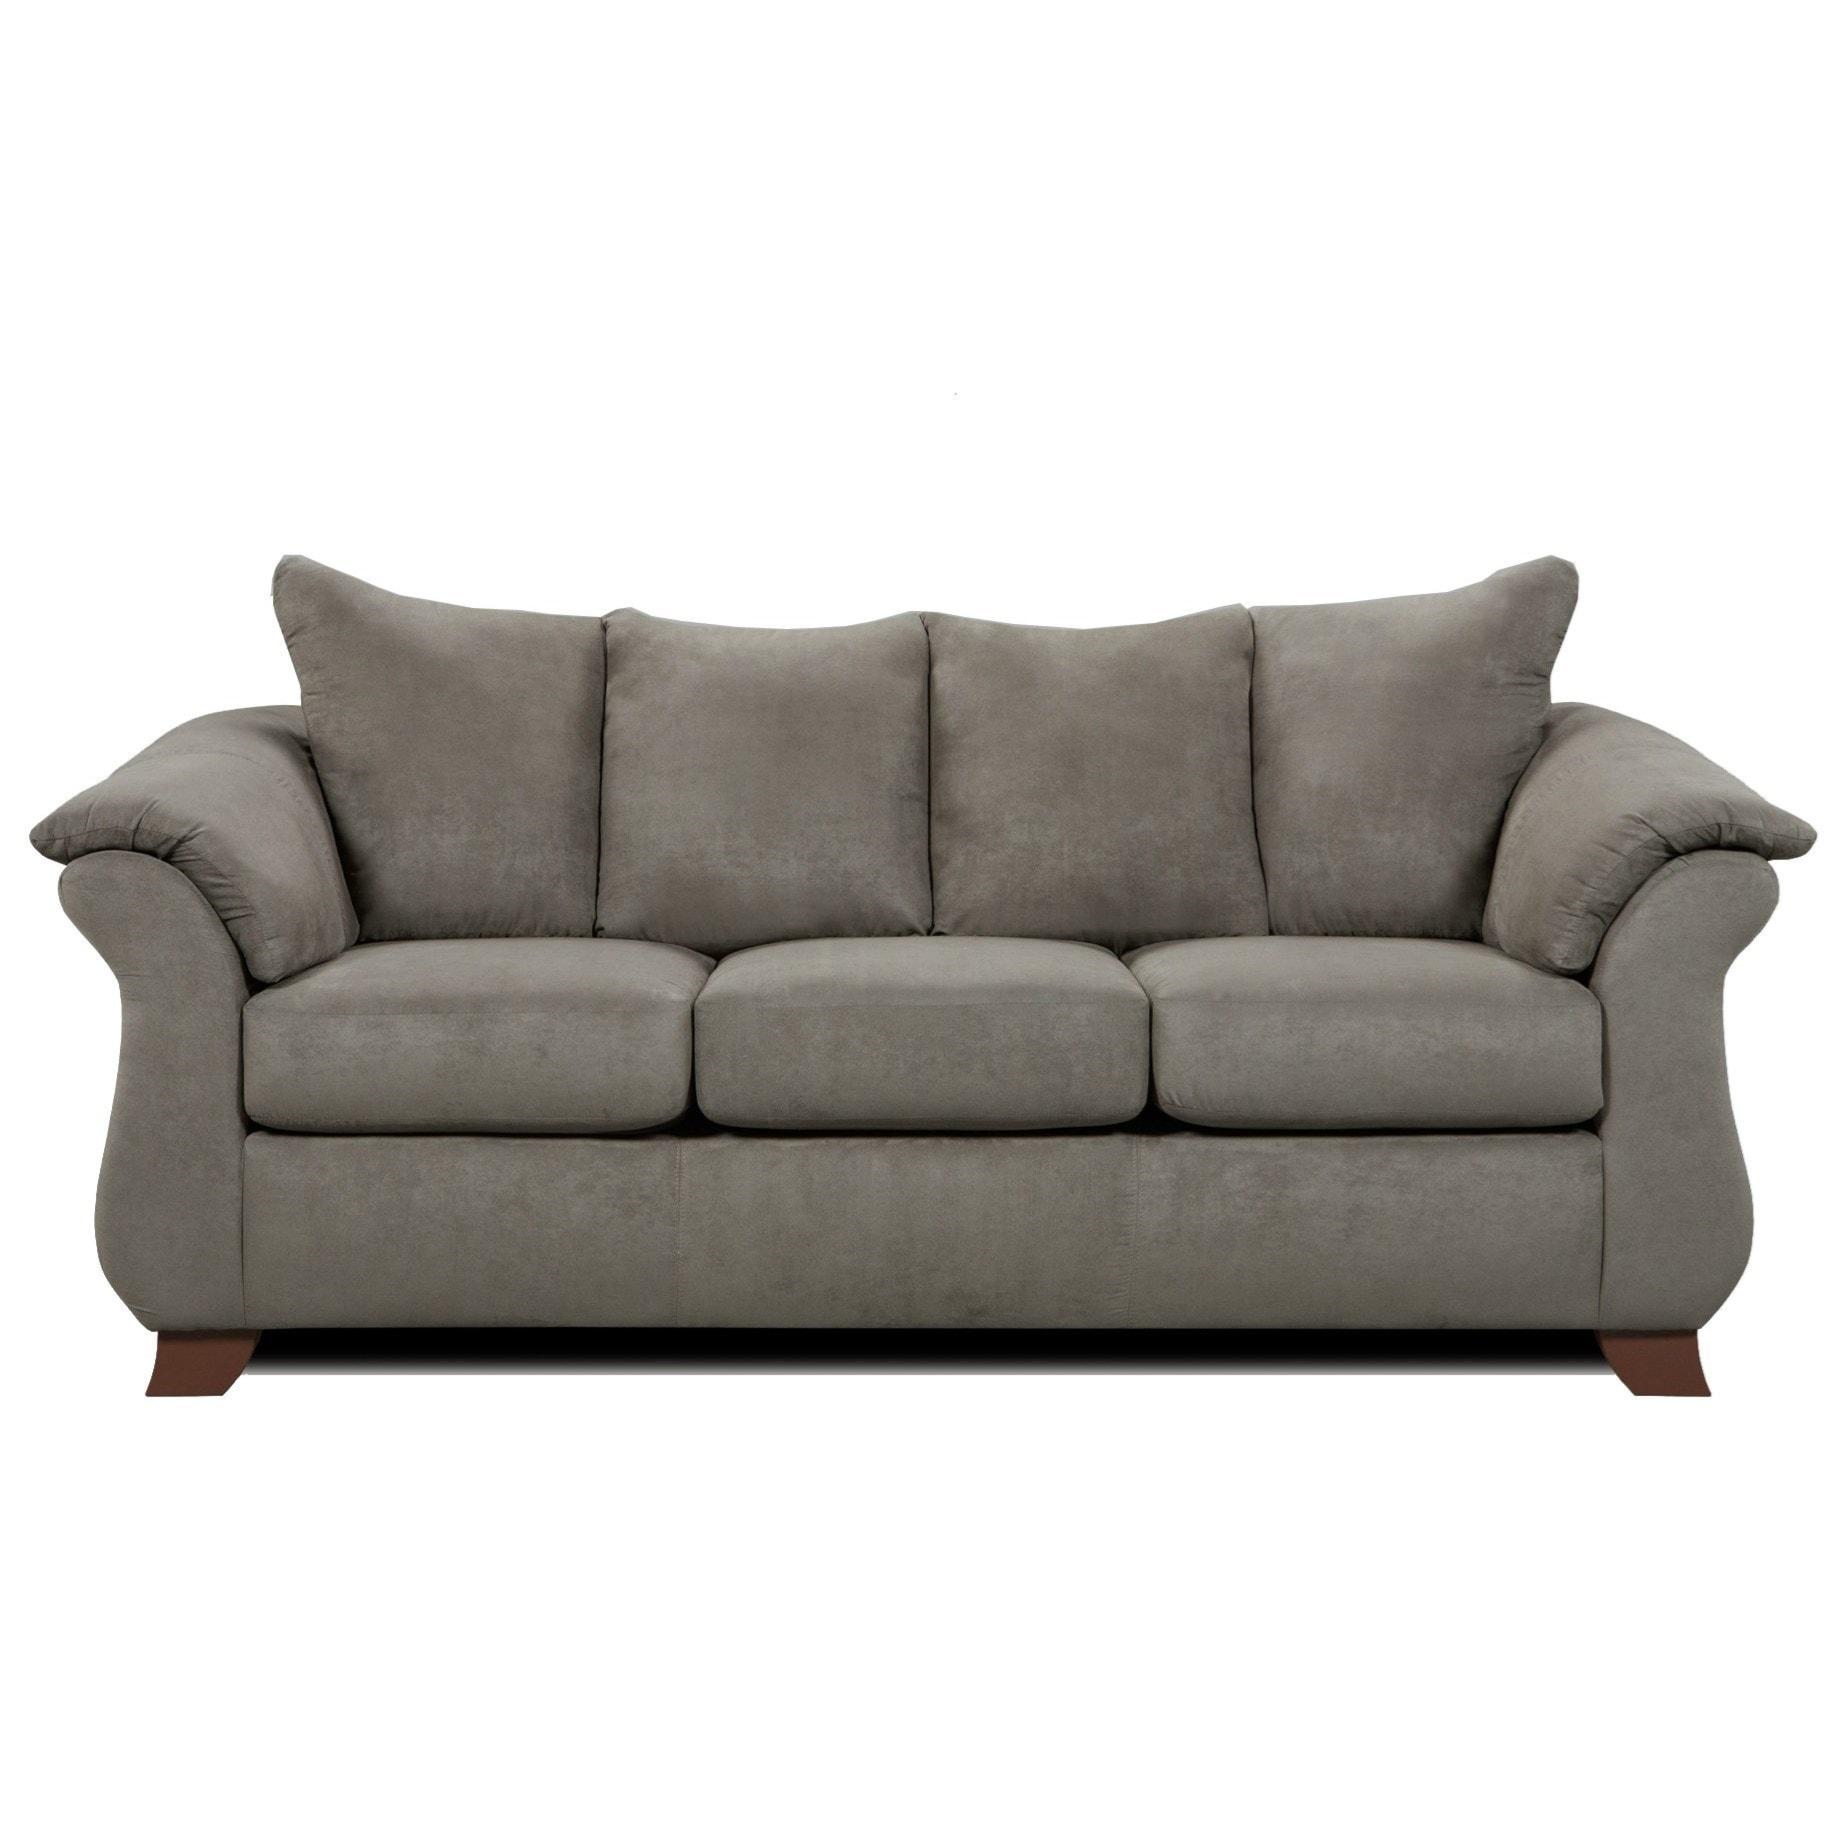 affordable furniture sensations red brick sofa. Affordable Furniture 6700Sofa; 6700Sofa Sensations Red Brick Sofa S